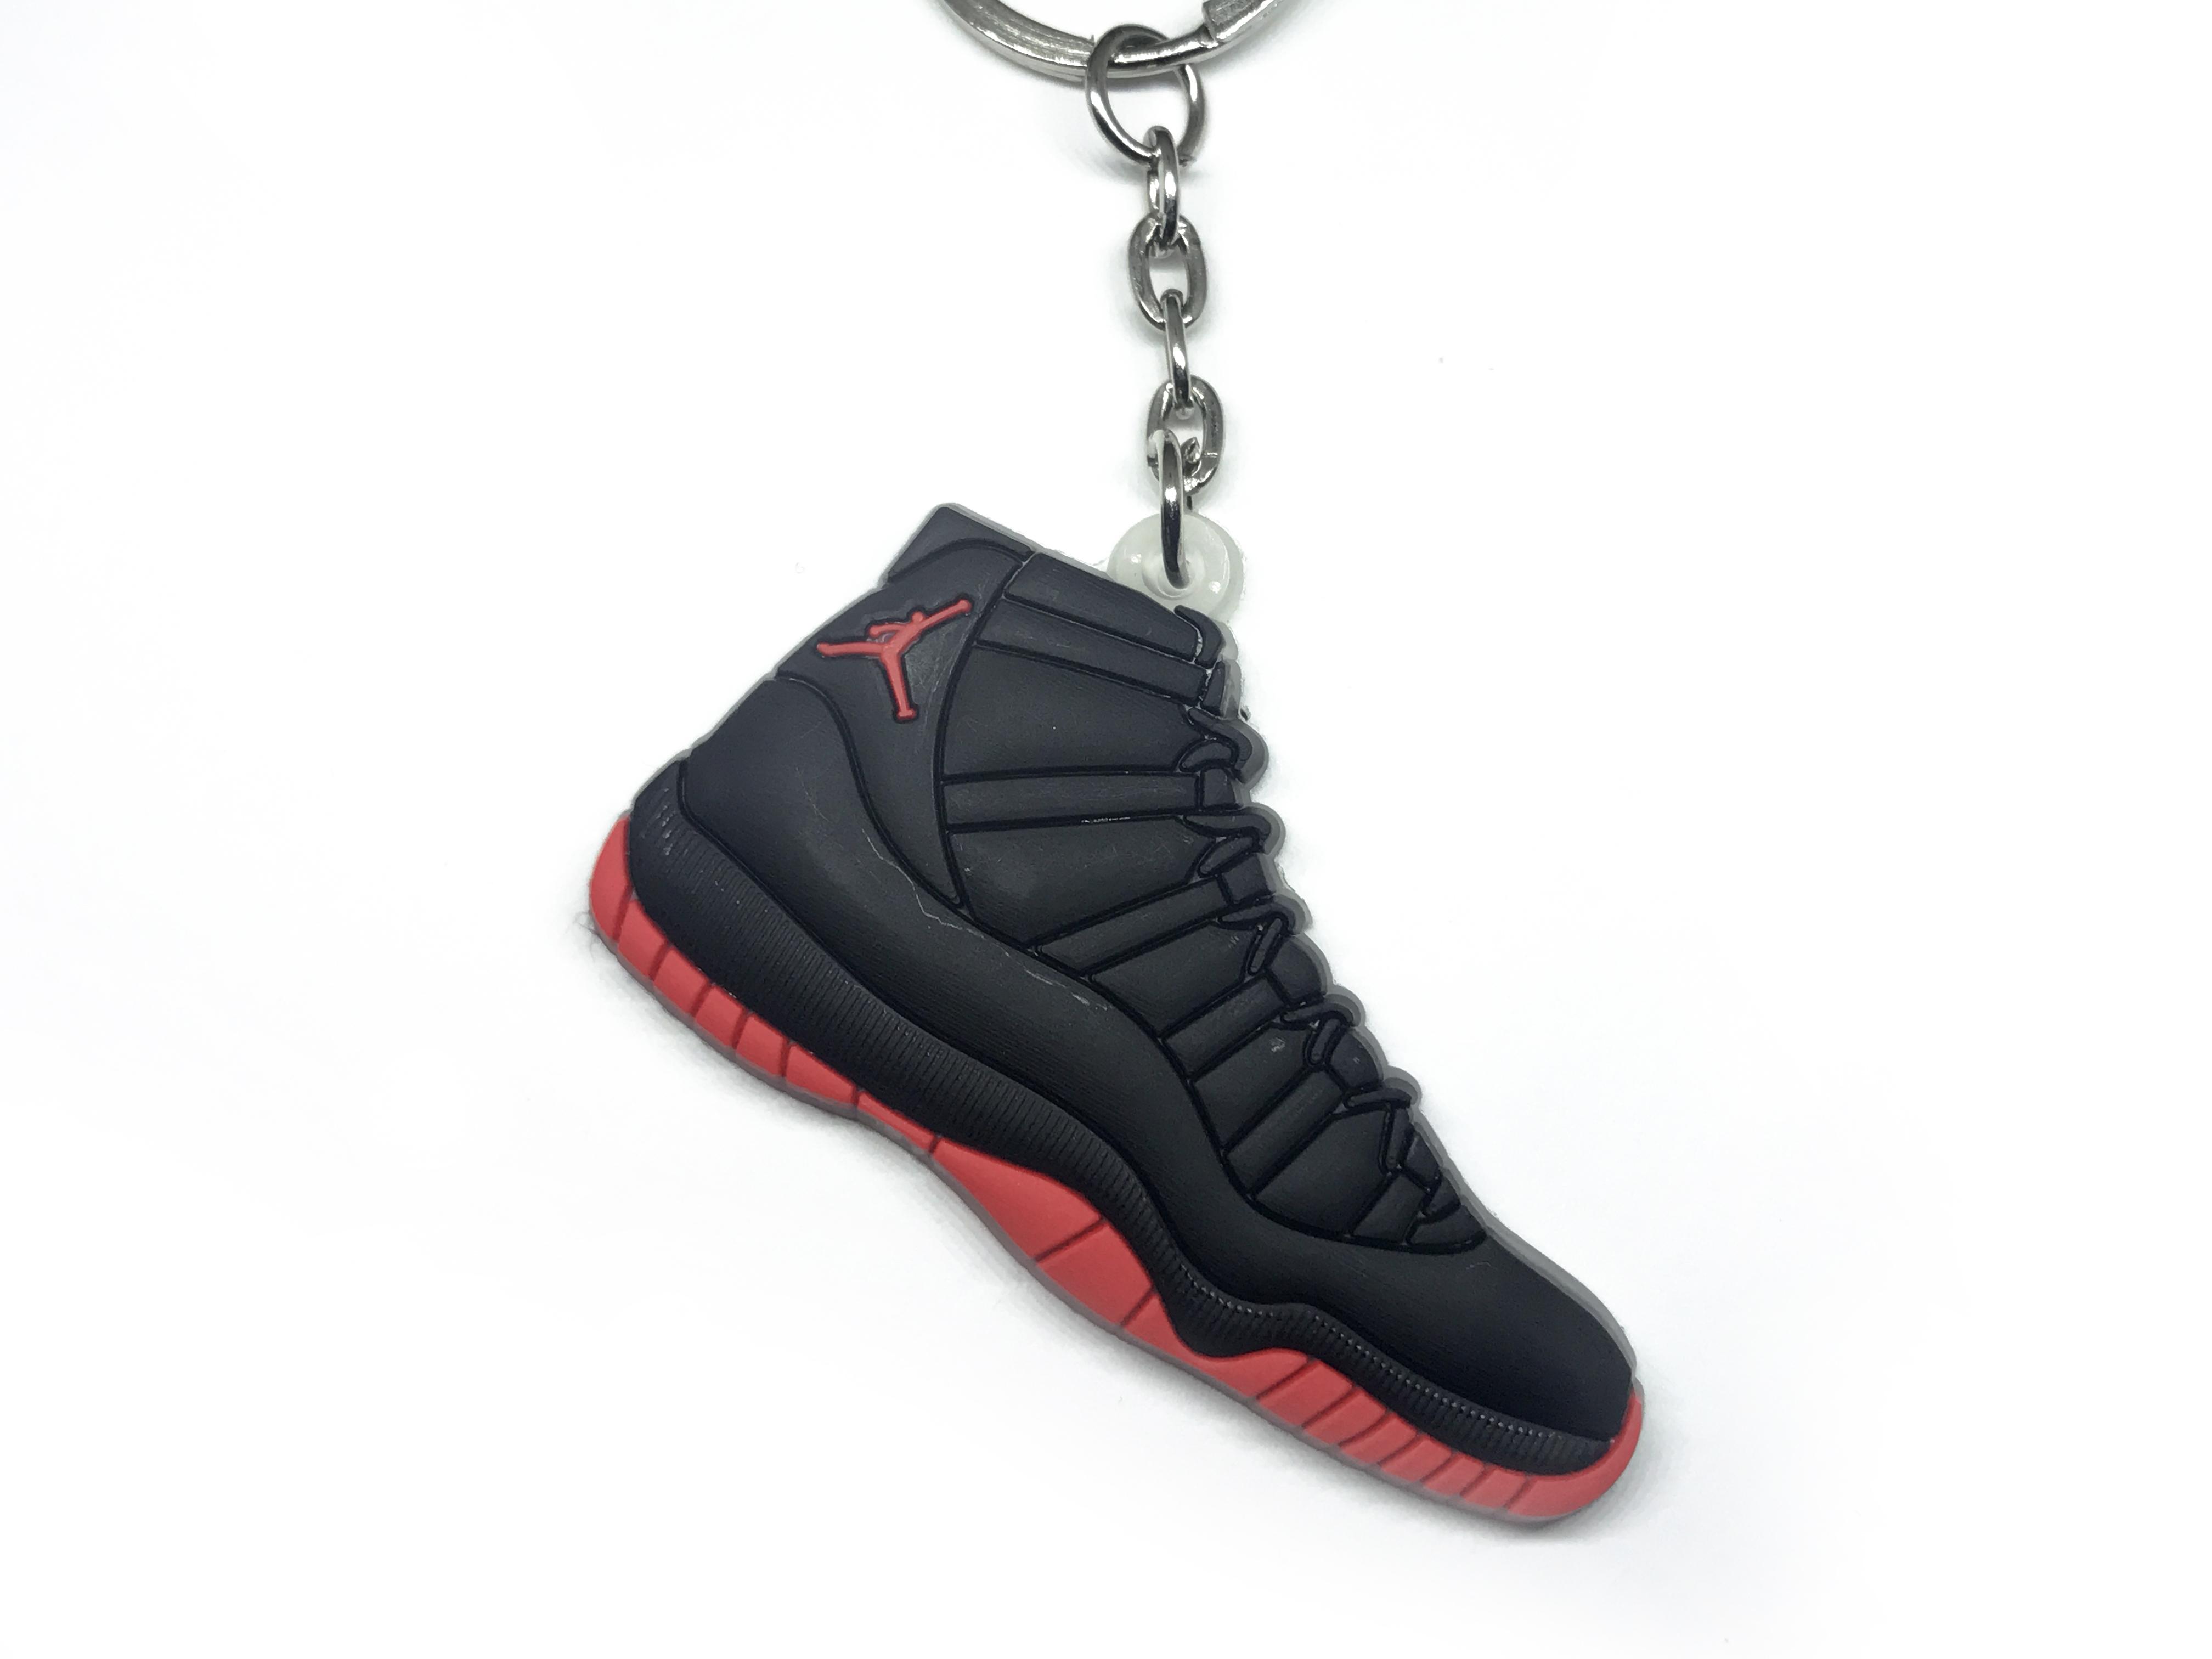 Air Jordan Black and Red Shoe Keychain